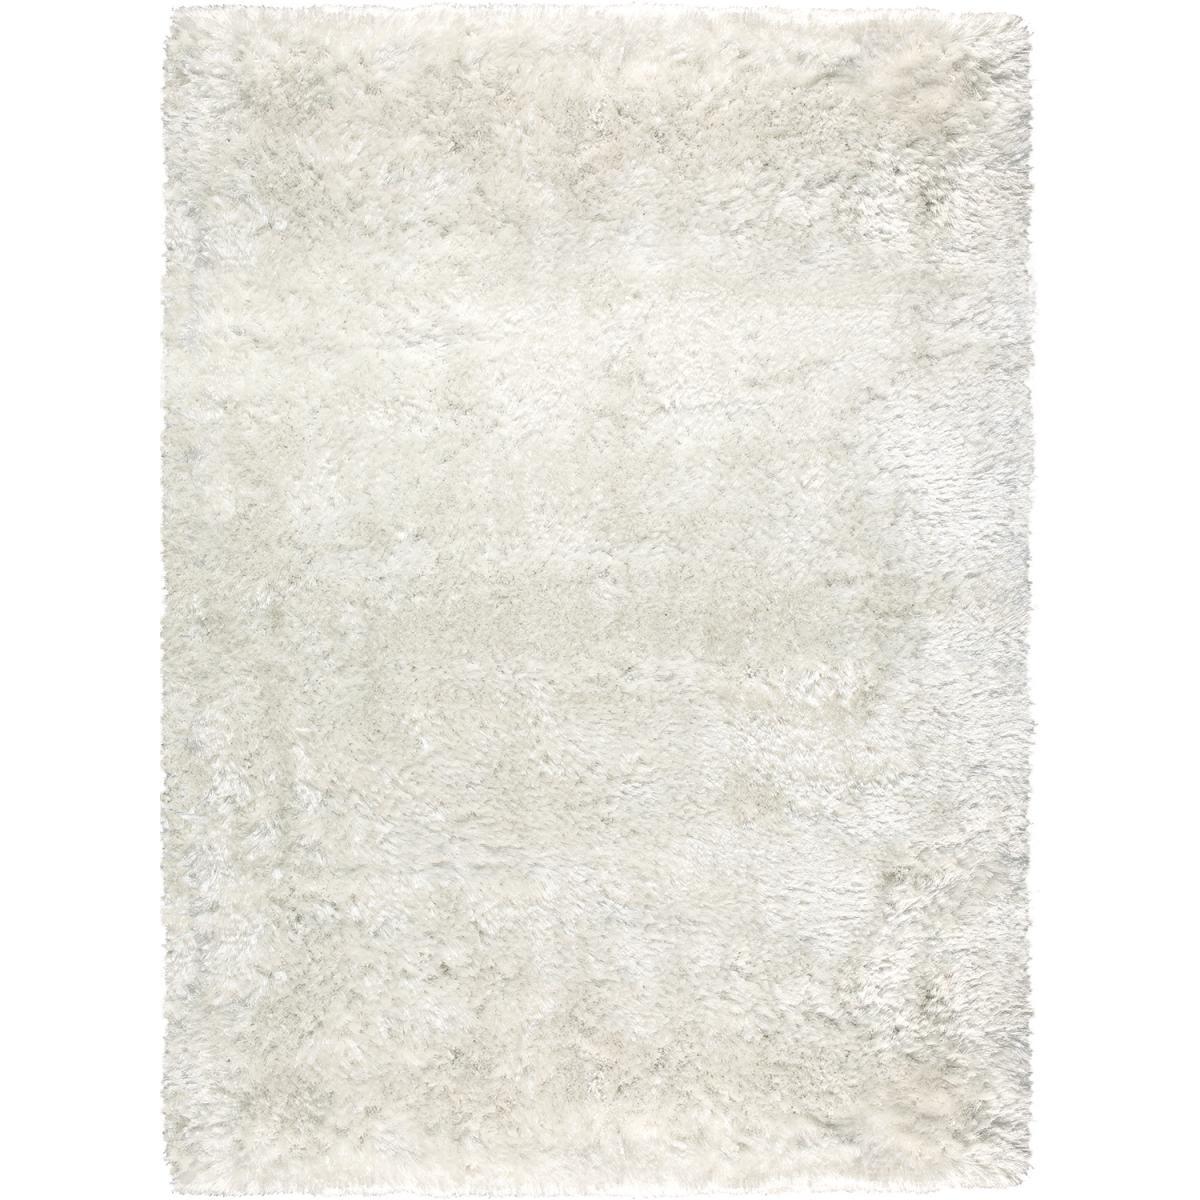 Tapis shaggy poils long en polyester blanc 250x350